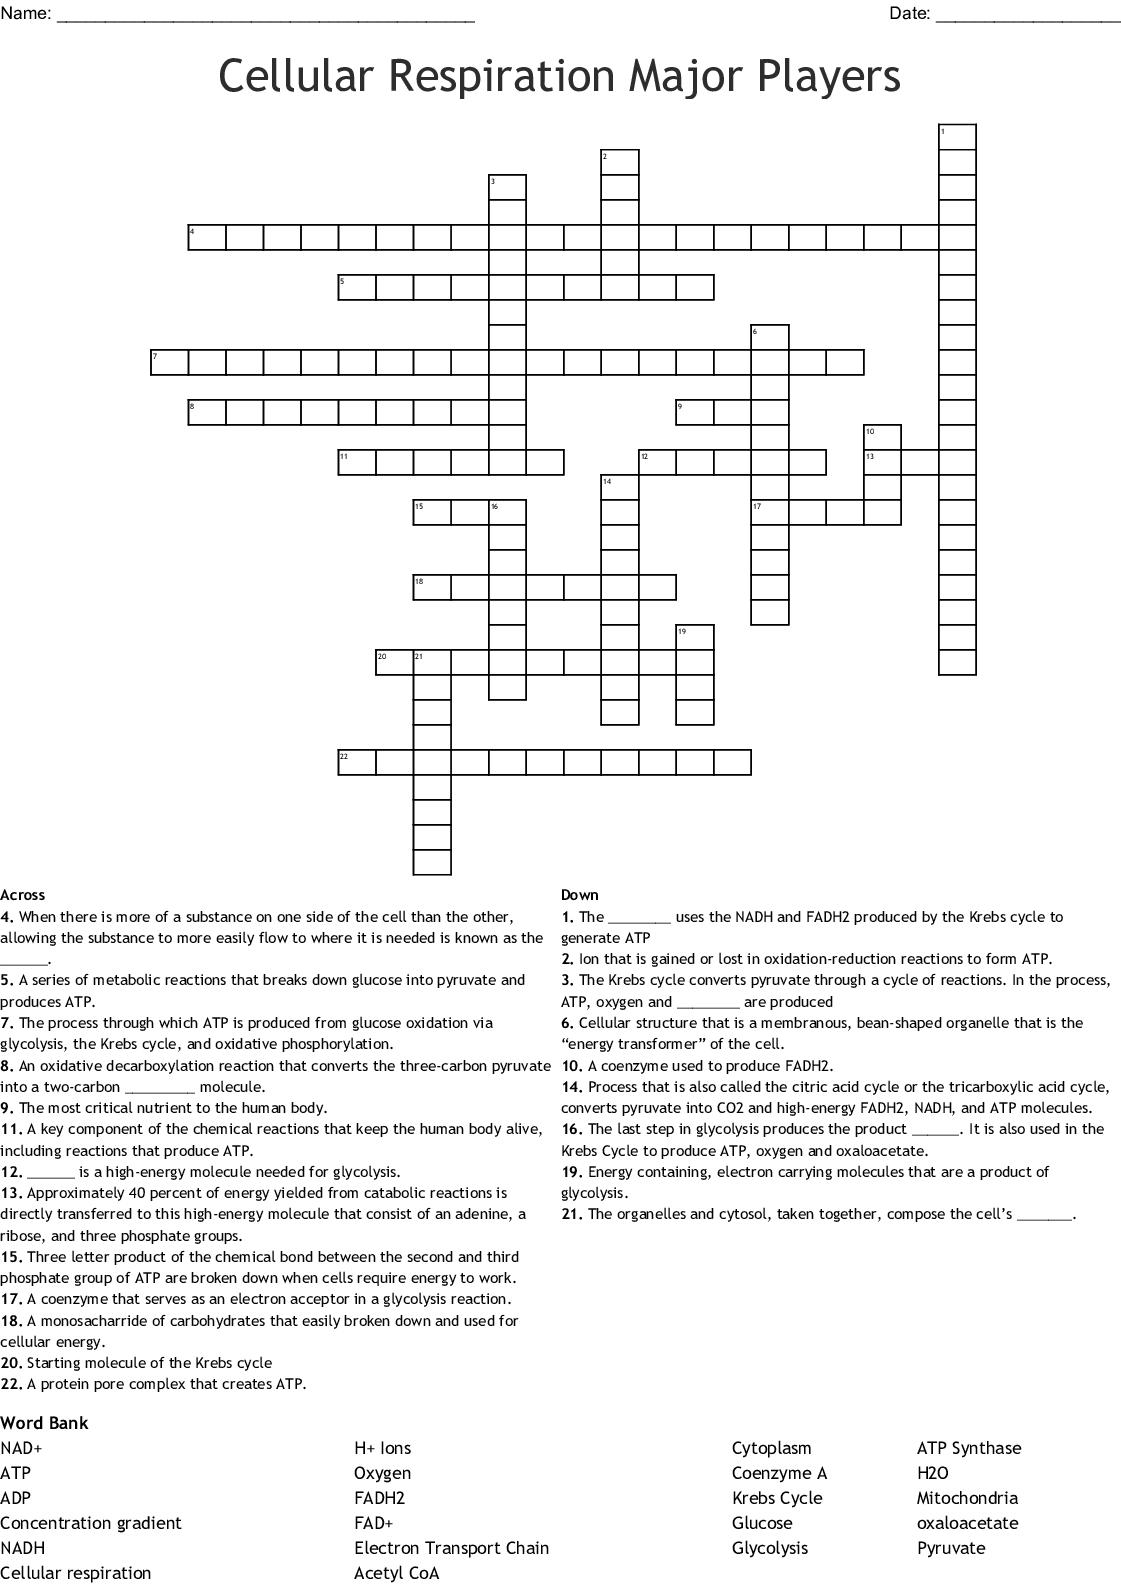 Cellular Respiration Major Players Crossword